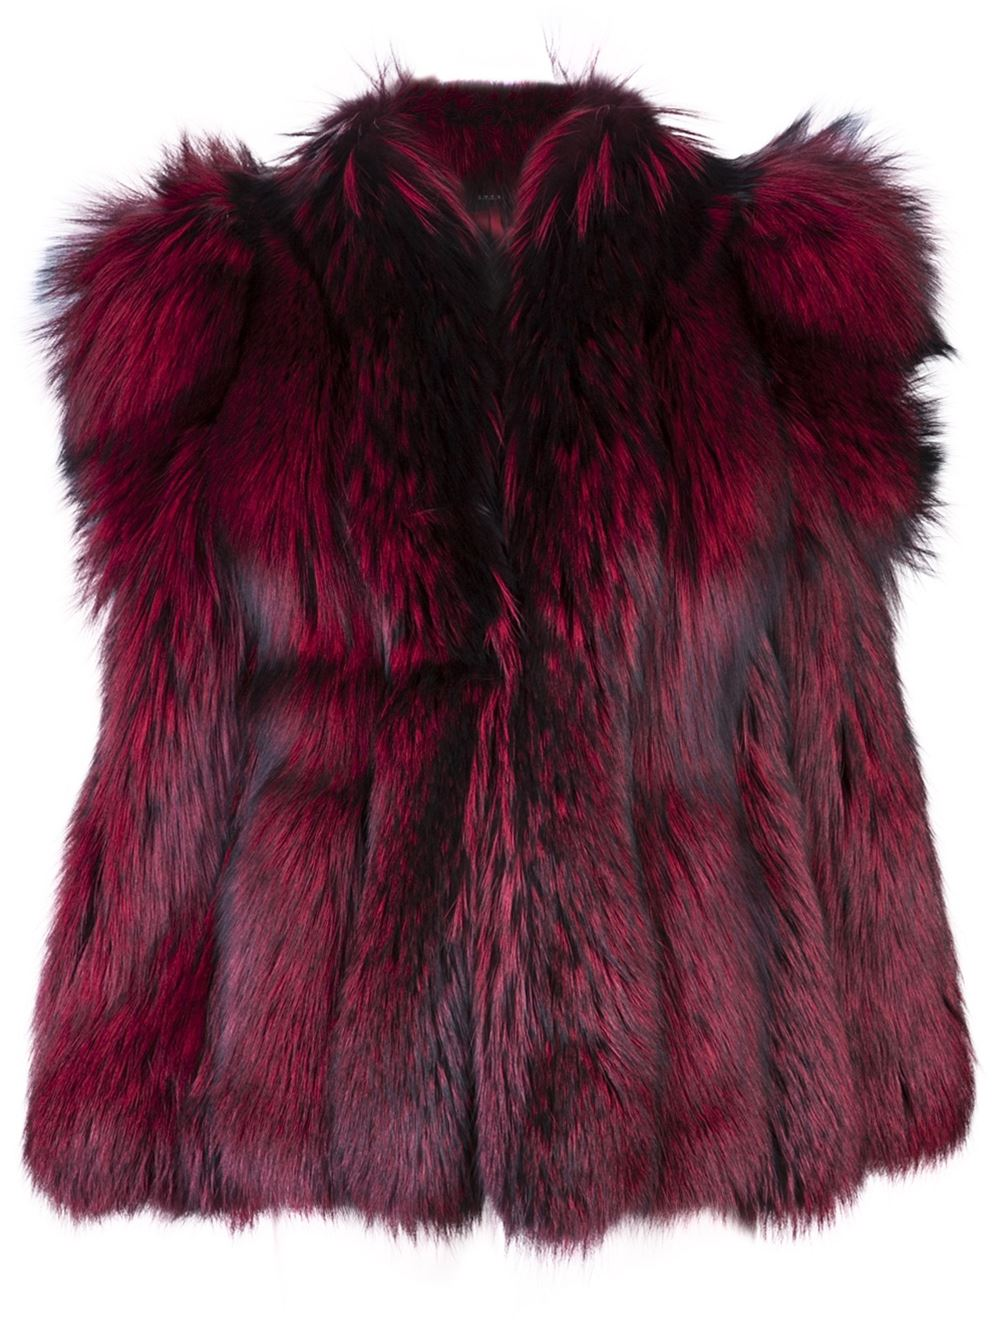 G.v.g.v. Oversized Fur Coat - H. Lorenzo - Farfetch.com